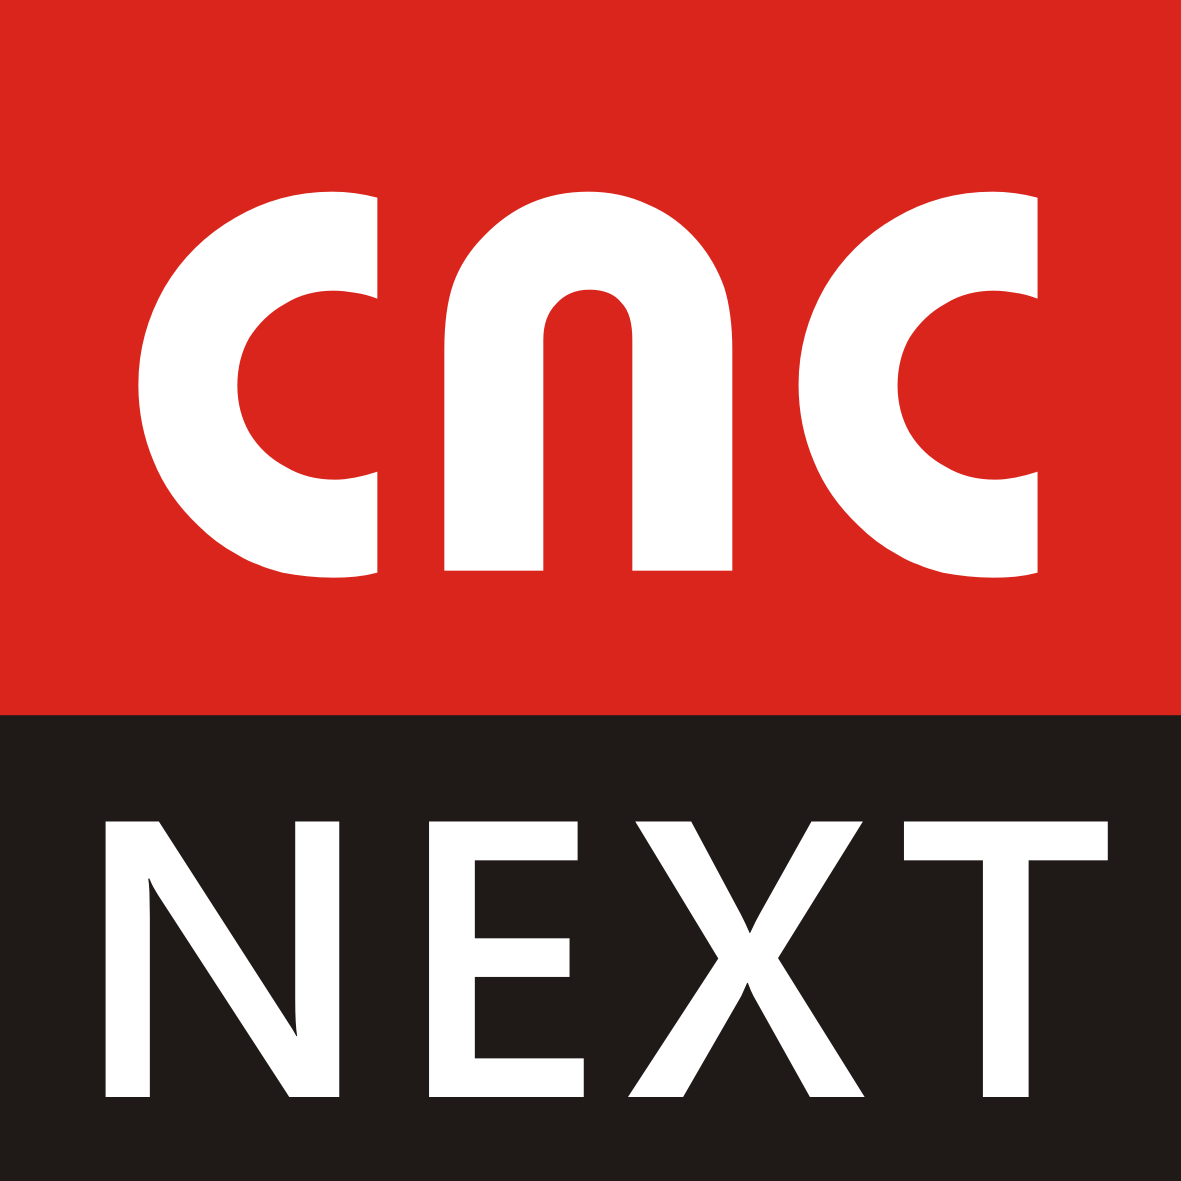 cnc glass logo